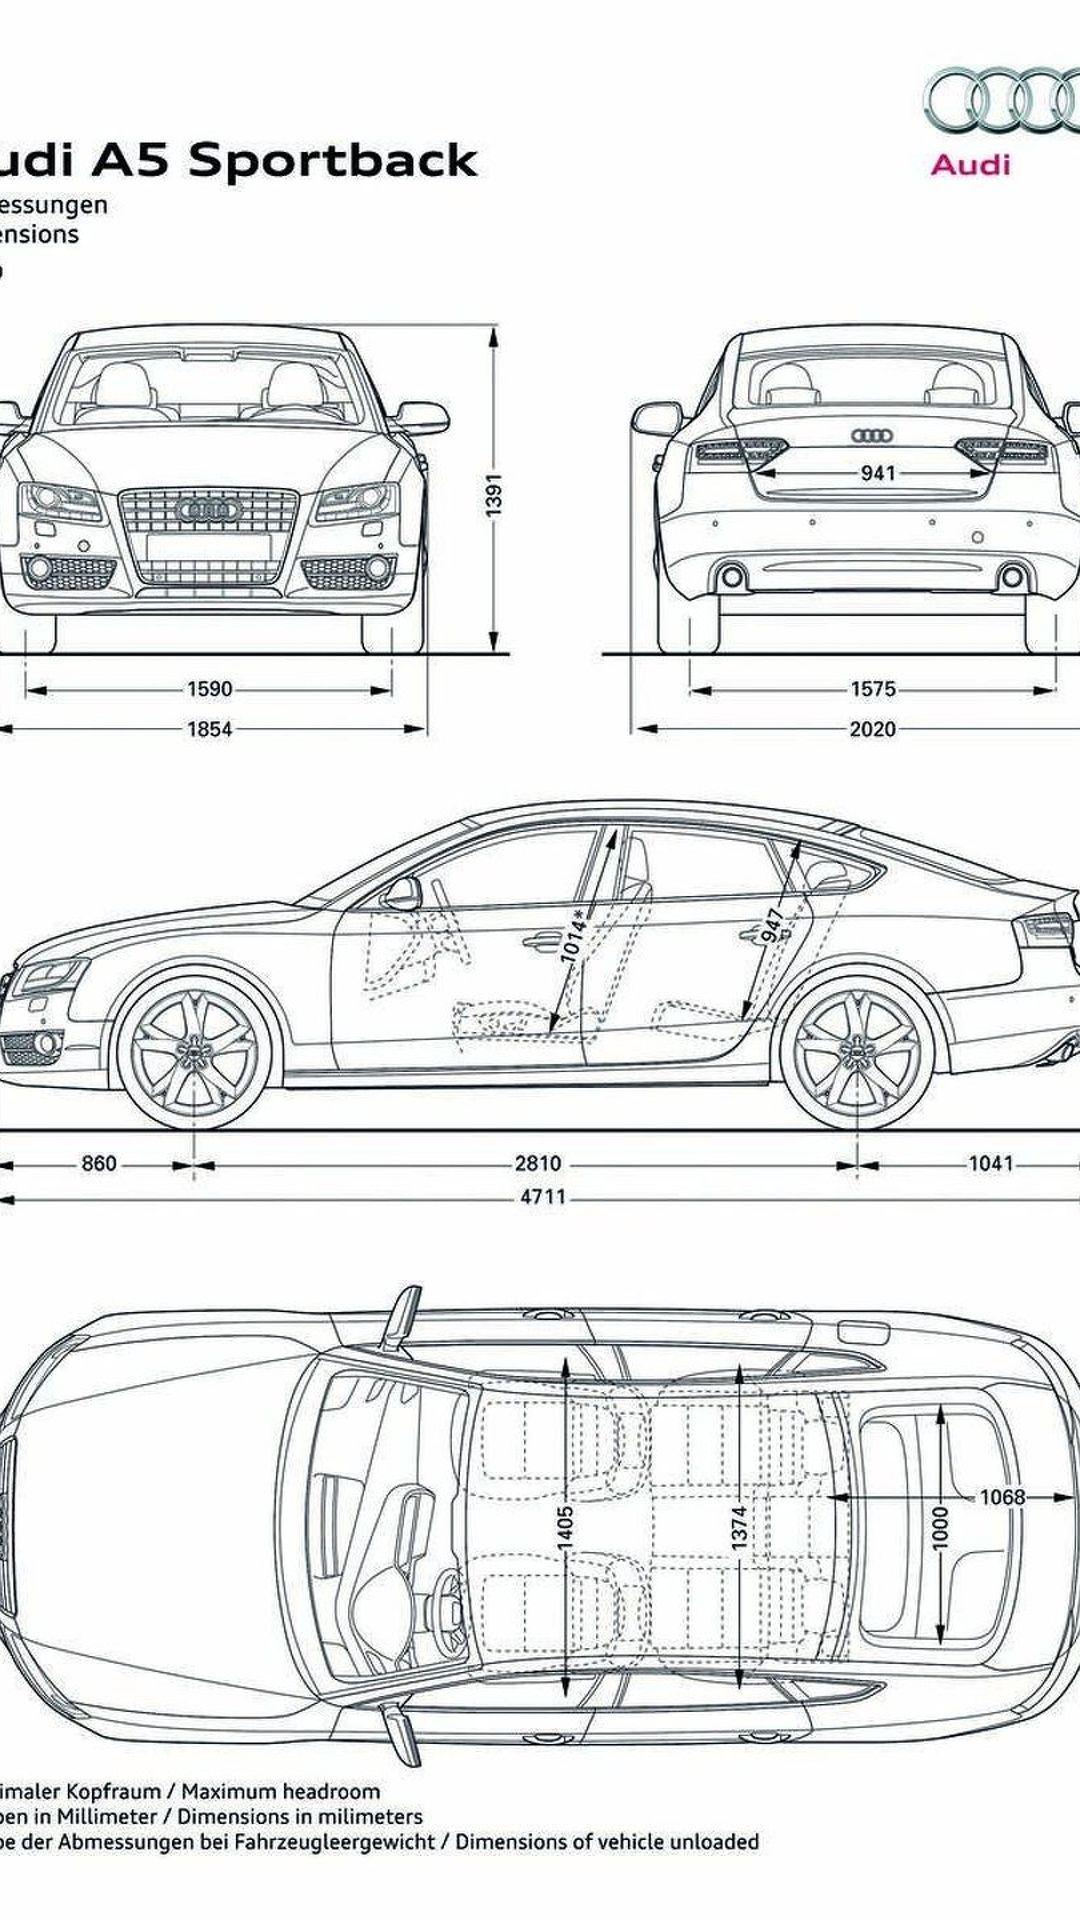 2012 Audi A5 S5 Facelift Revealed